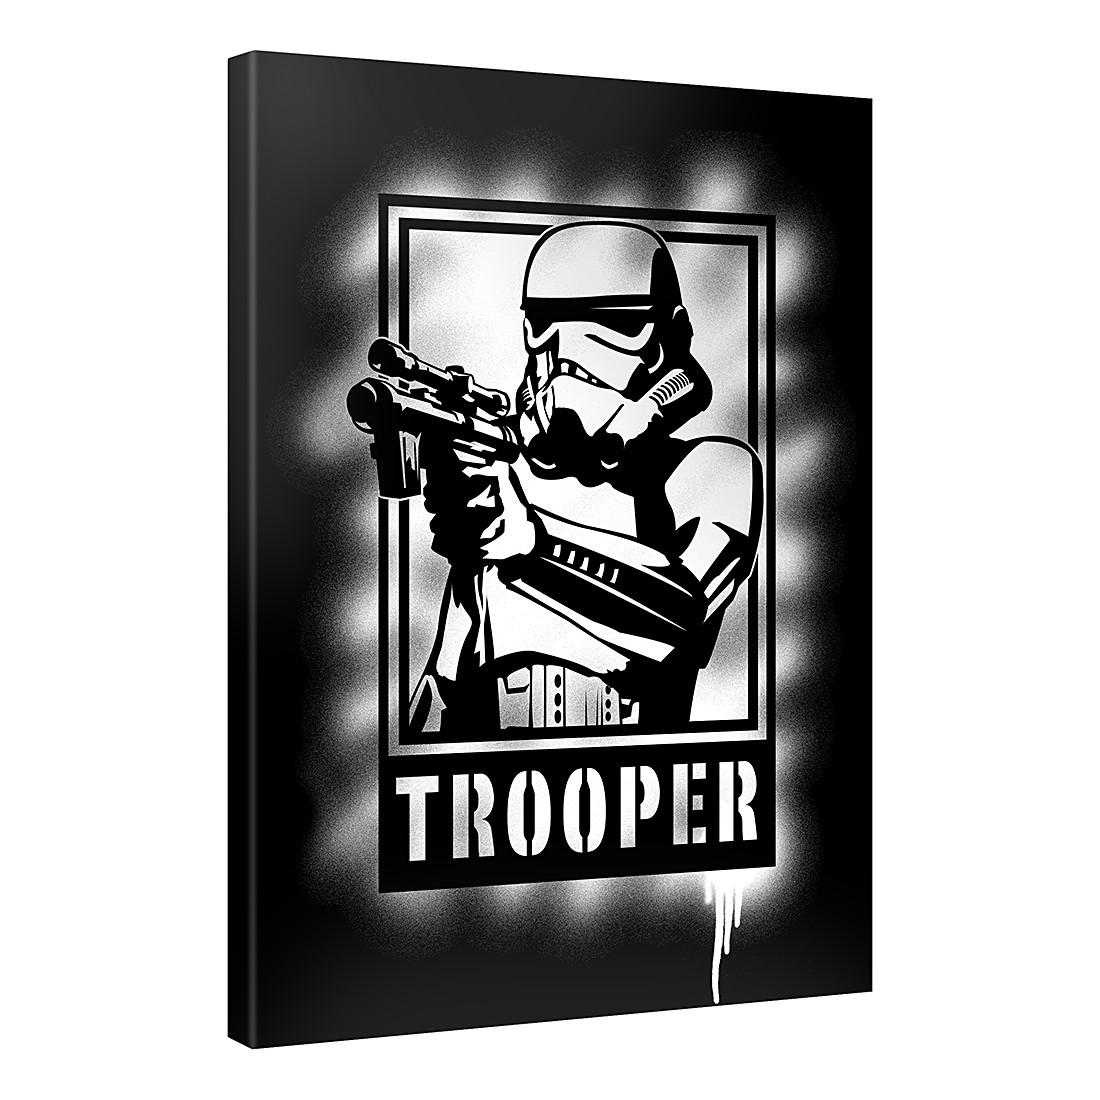 Leinwandbild Trooper Artwork – 100×75 cm, Gallery of Innovative Art günstig bestellen